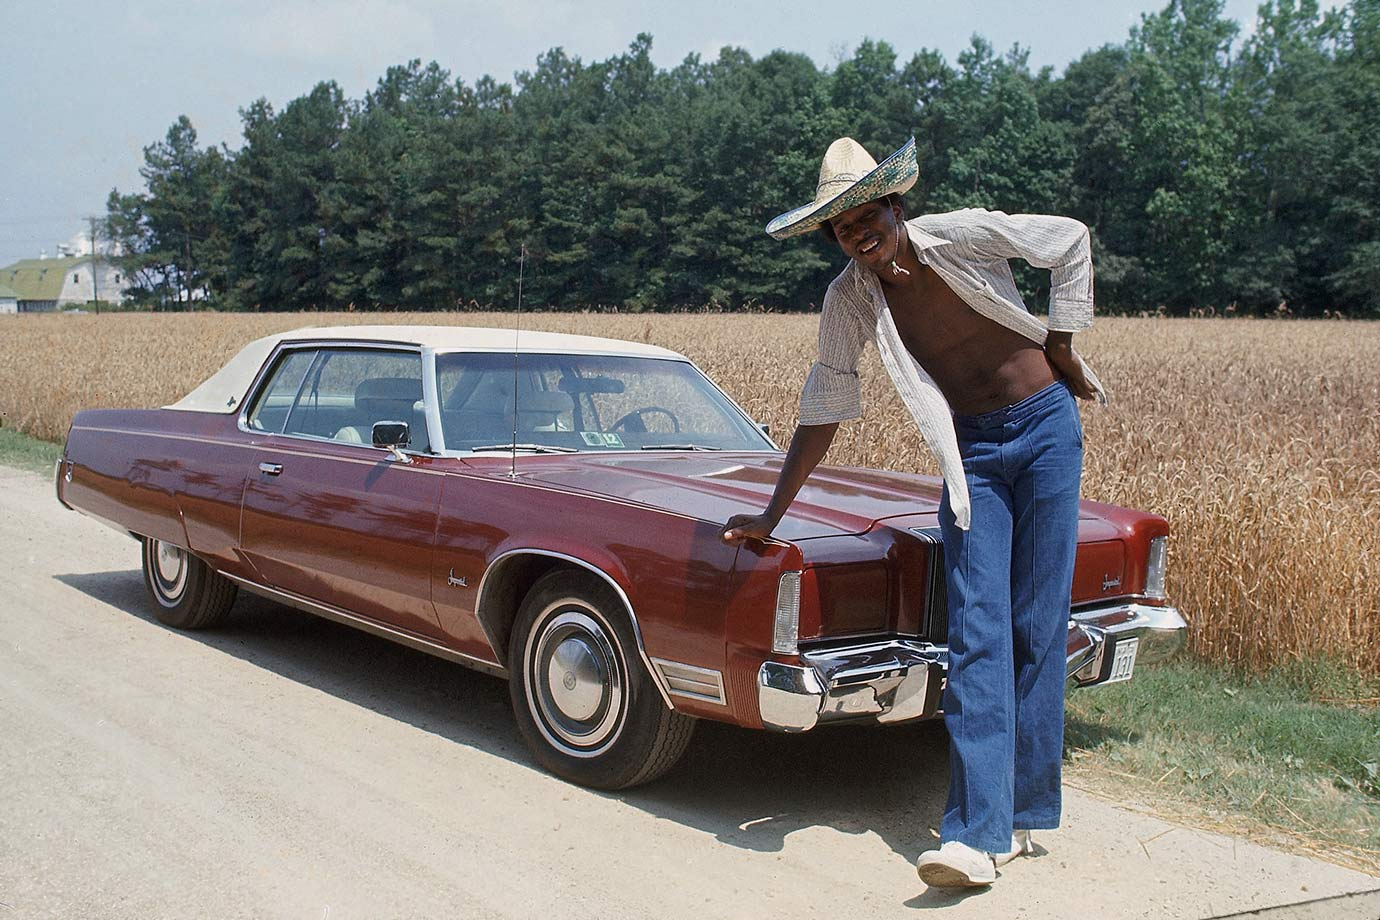 June 21, 1974